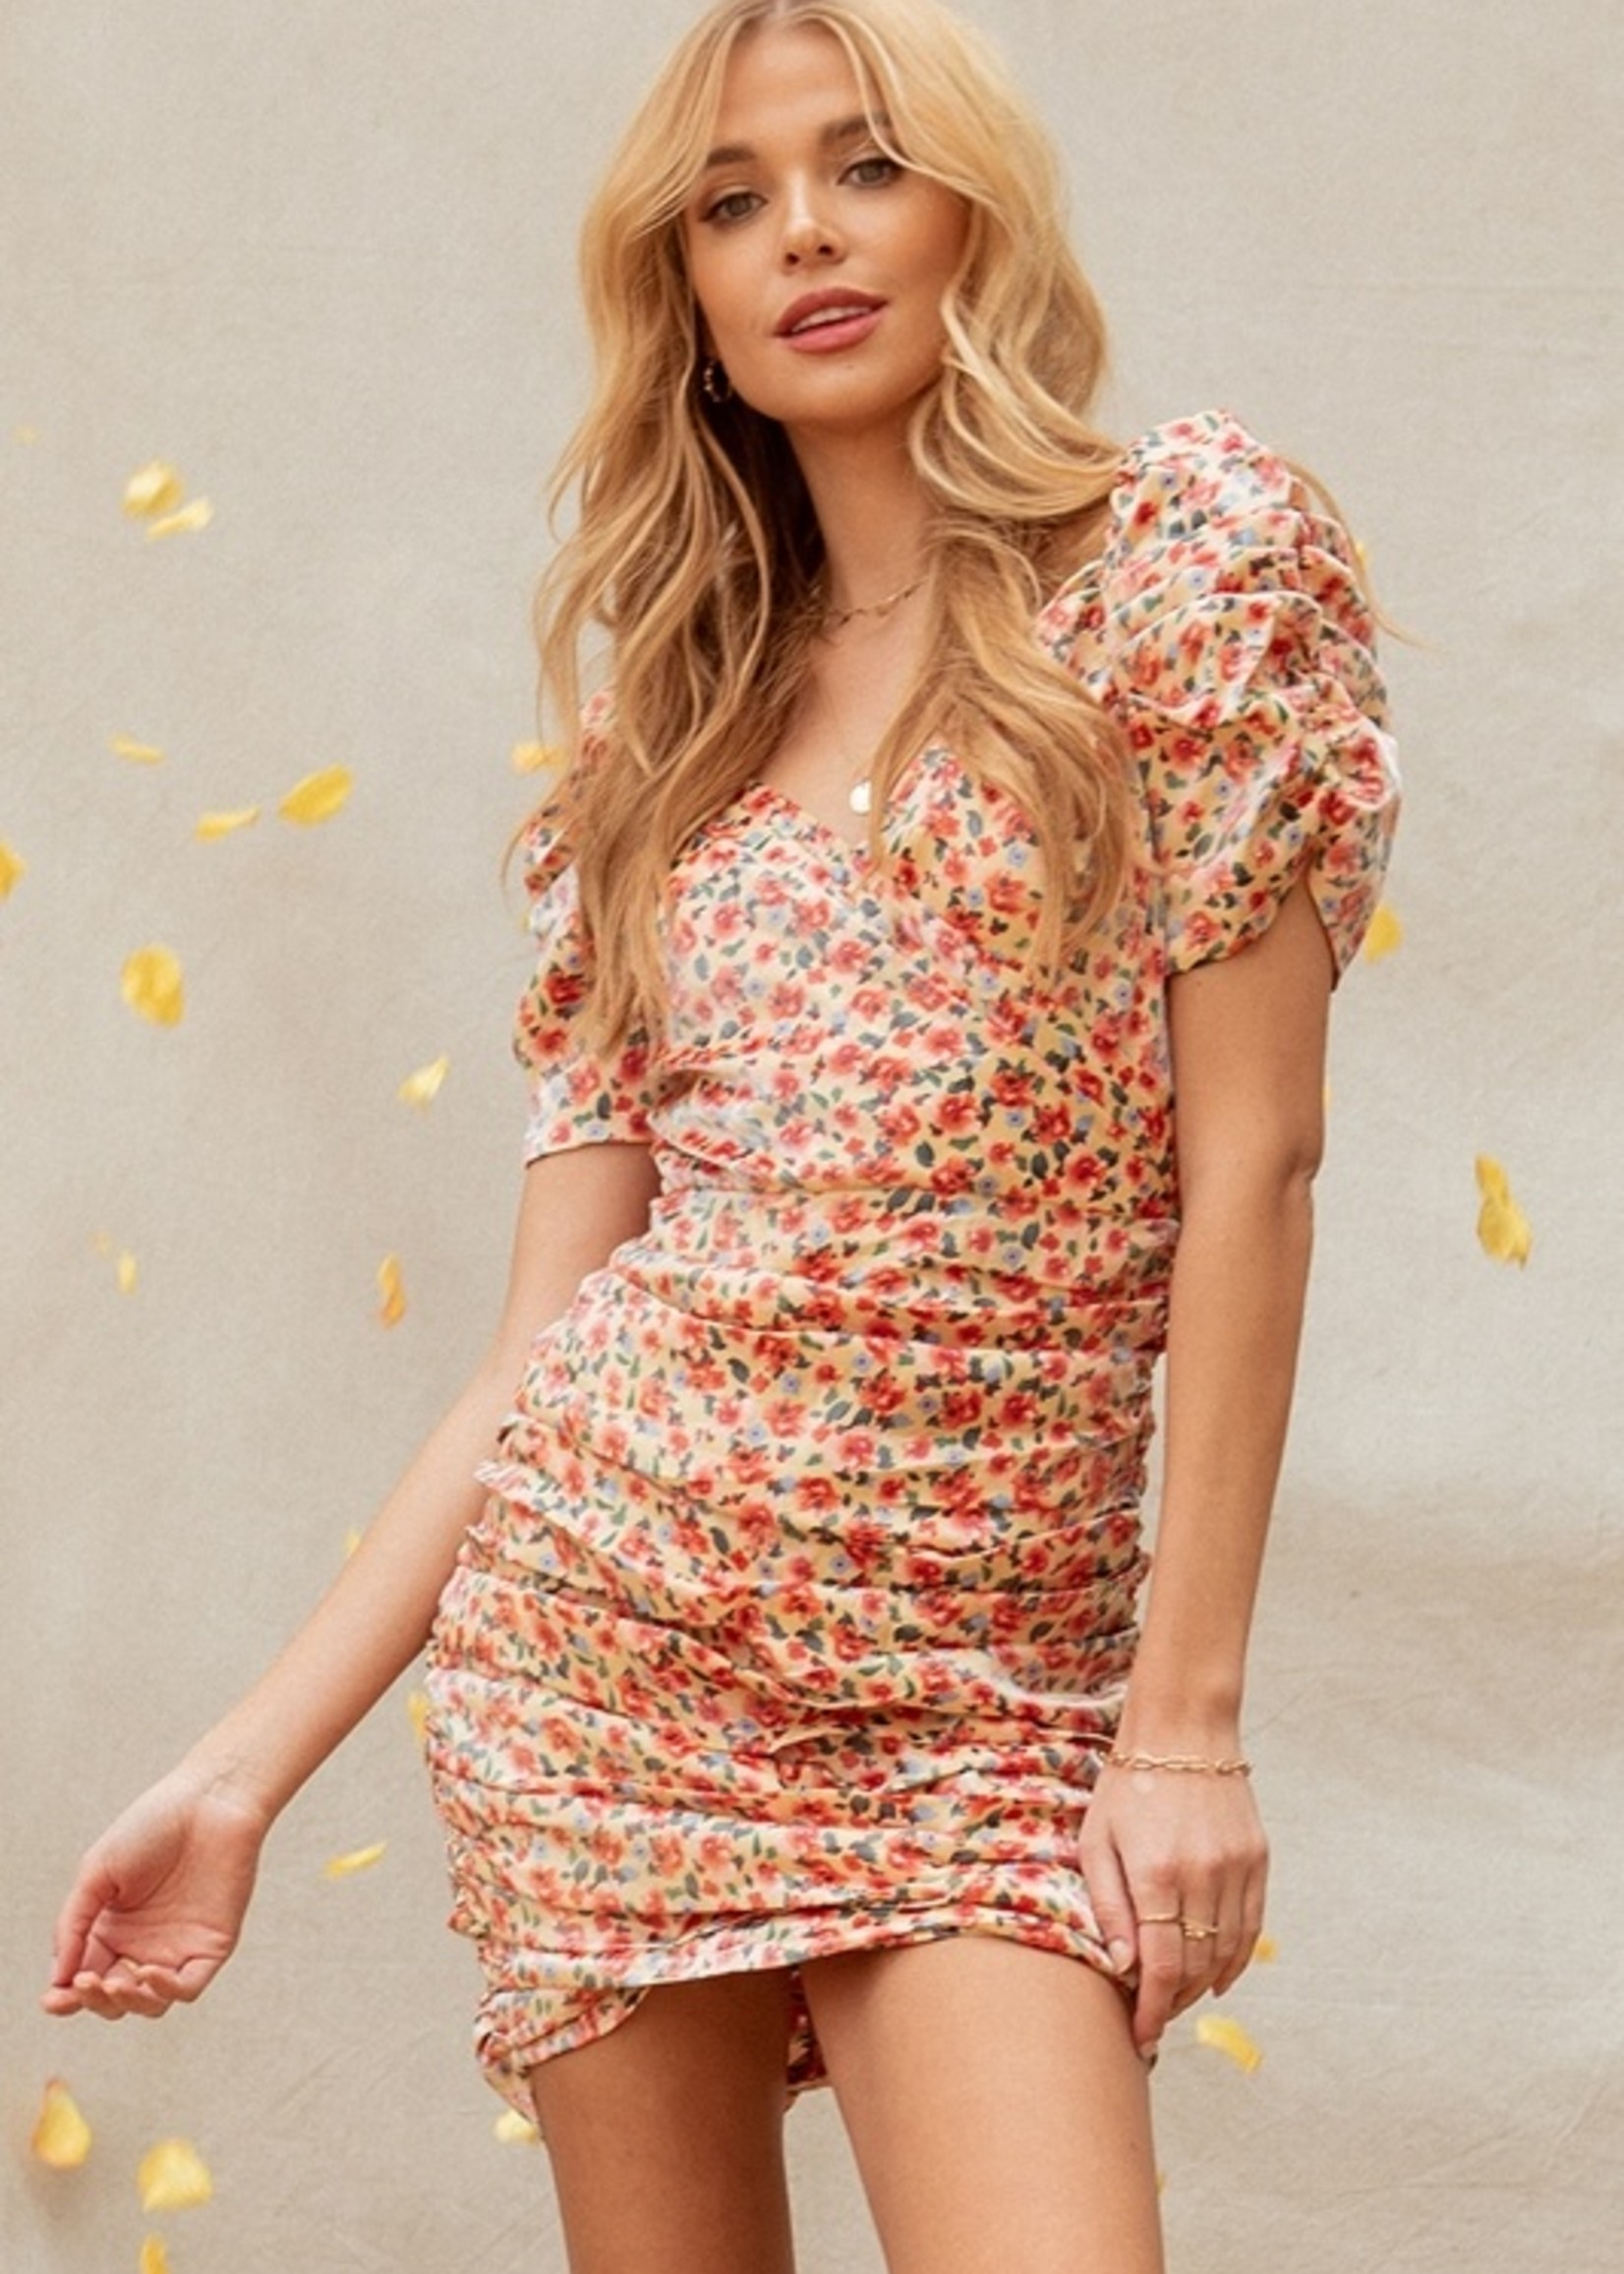 Fanco Gold Flower Ruched Dress